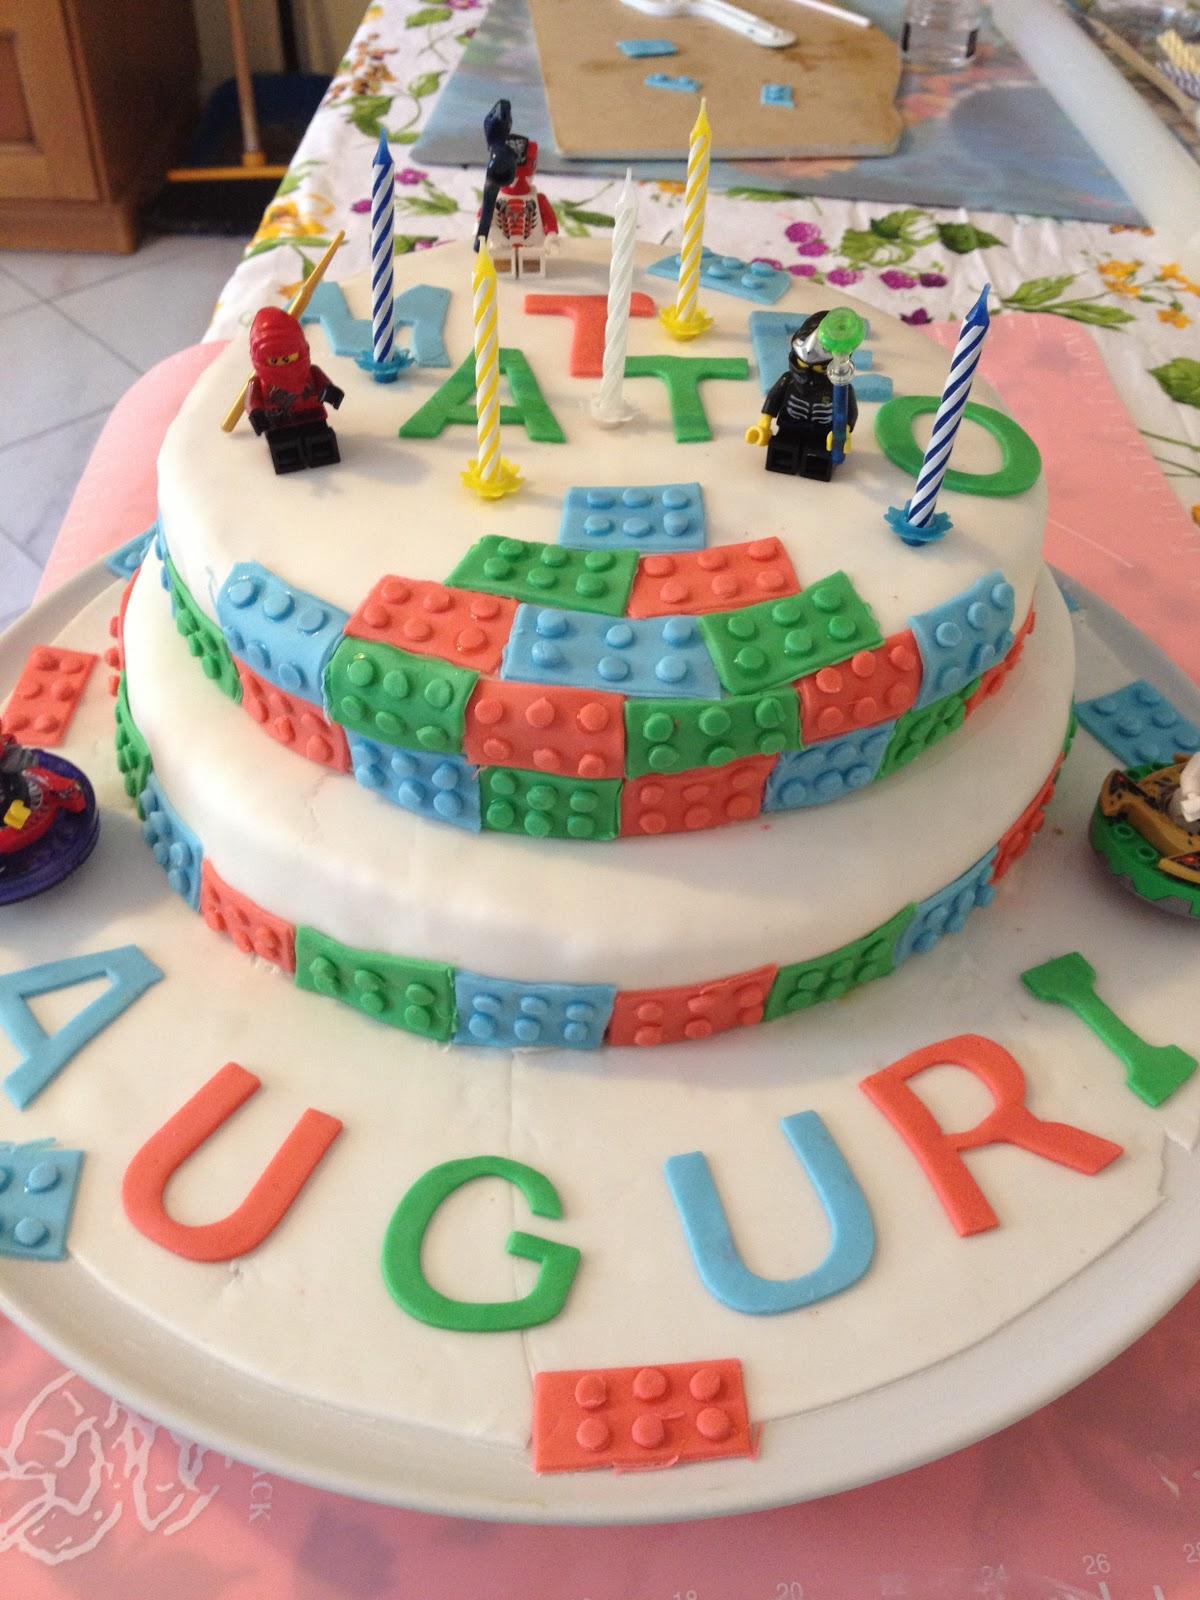 Yummymummy: Torta in pasta di zucchero lego fai da te